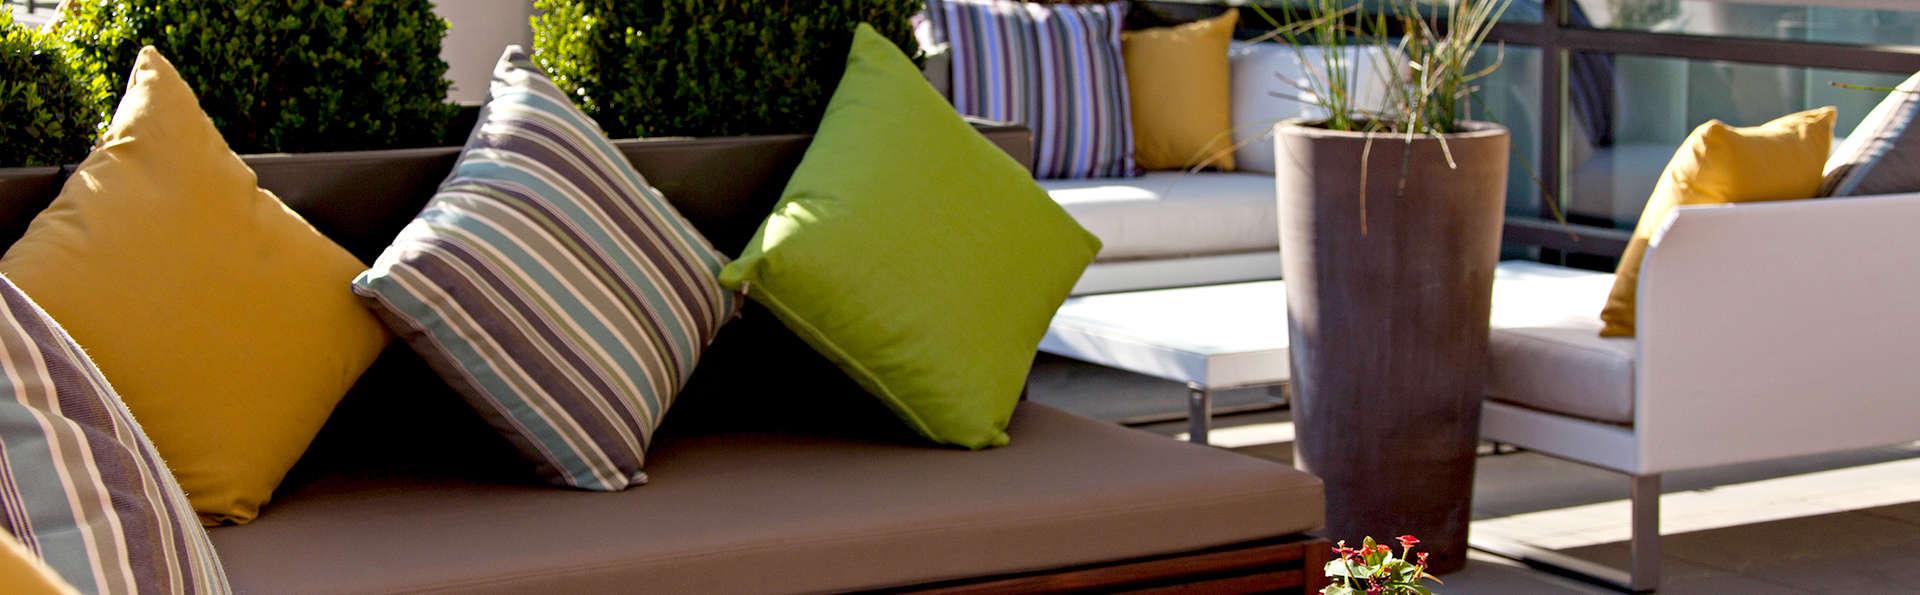 Hotel Renaissance Aix en Provence - Edit_Terrace4.jpg